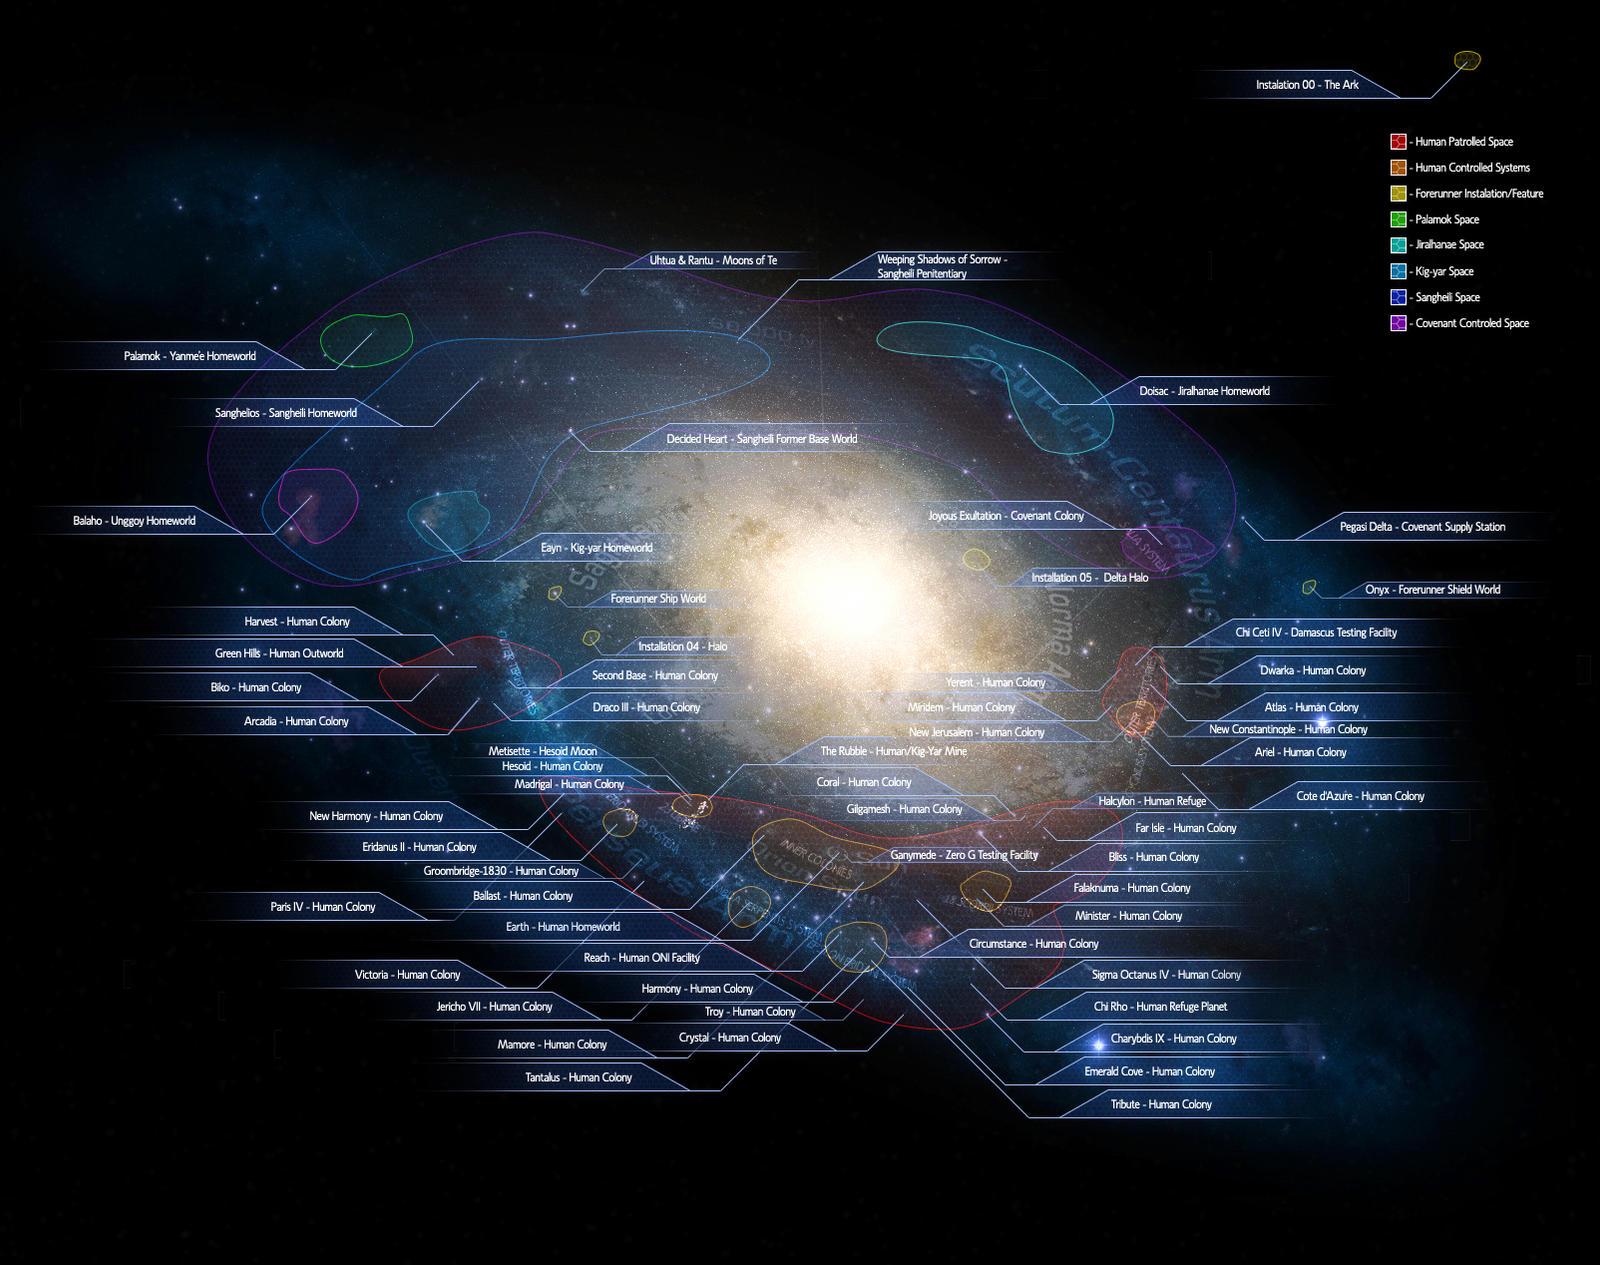 NASA Galaxy Map - Pics about space